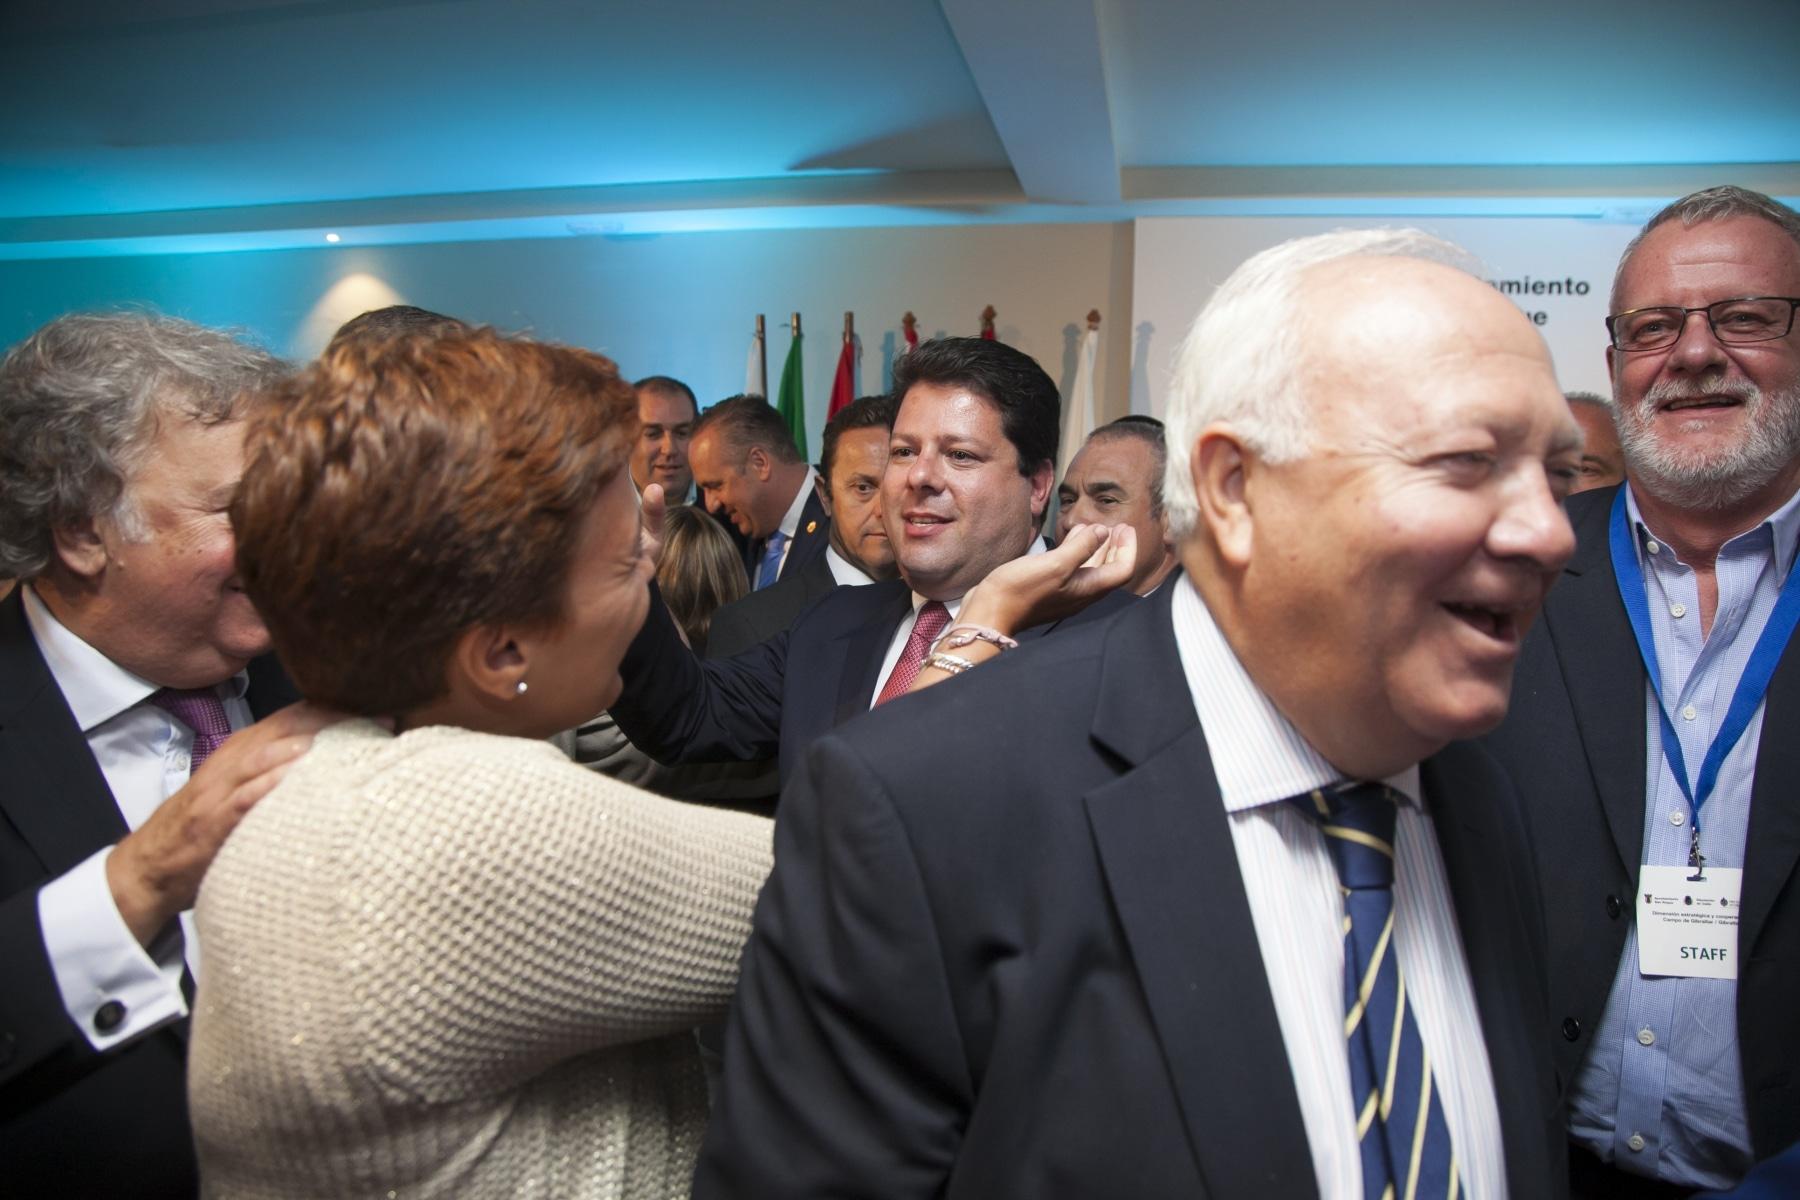 la-exalcaldesa-de-la-lnea-de-la-concepcin-gemma-araujo-psoe-saluda-al-ministro-principal-de-gibraltar-fabian-picardo_20802487833_o